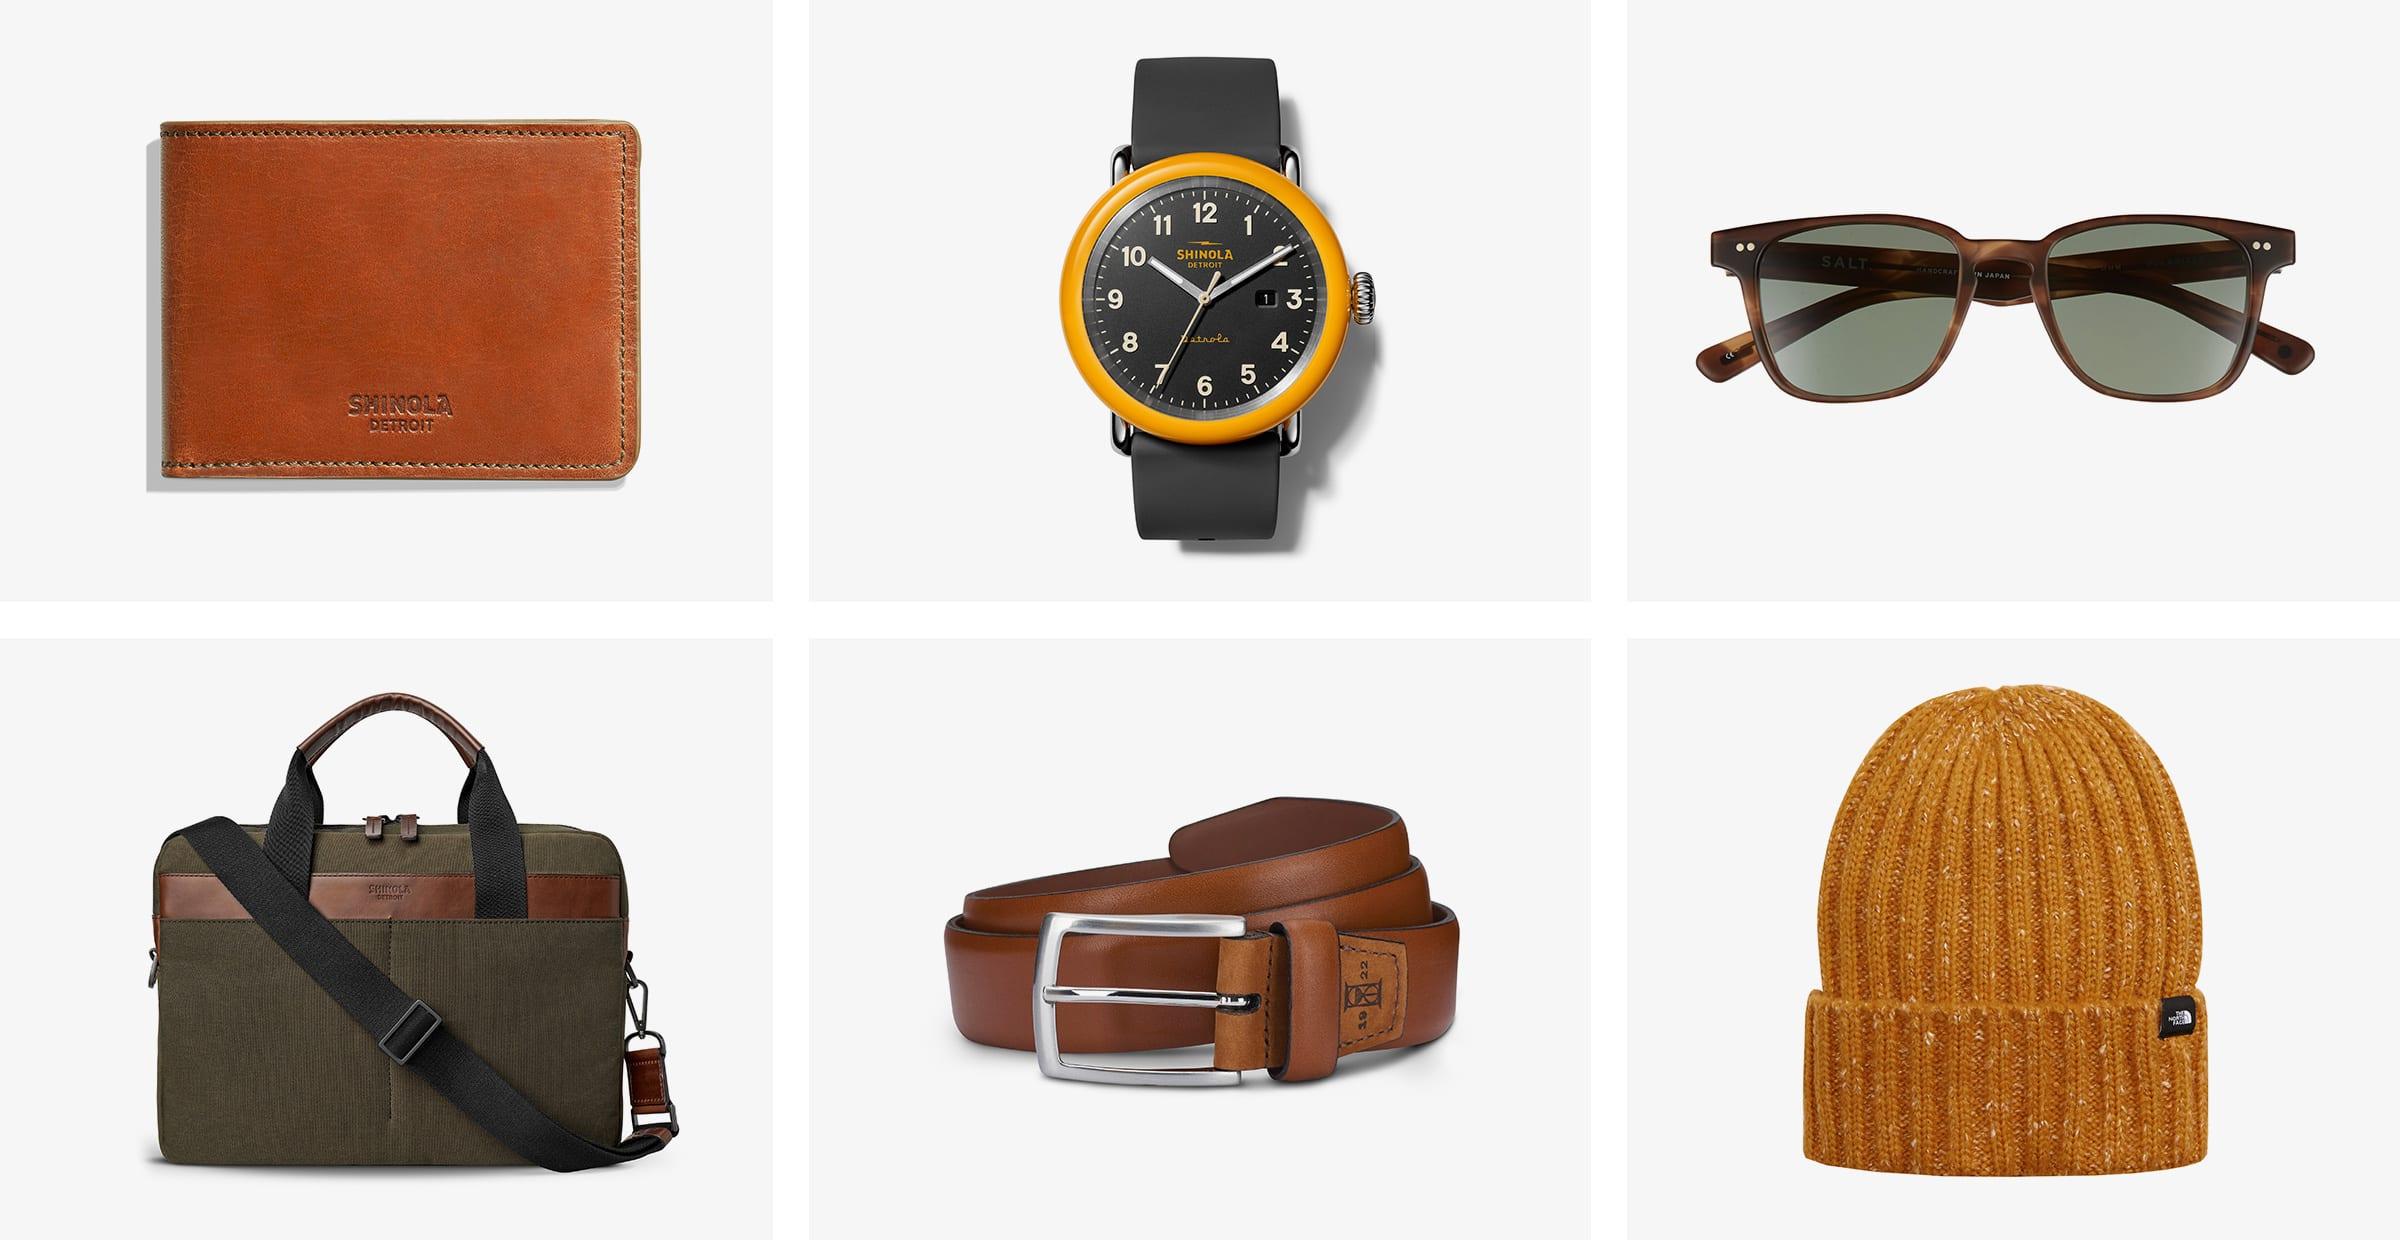 Men's accessories: wallet, sunglasses, watch, work bag, belt, and beanie